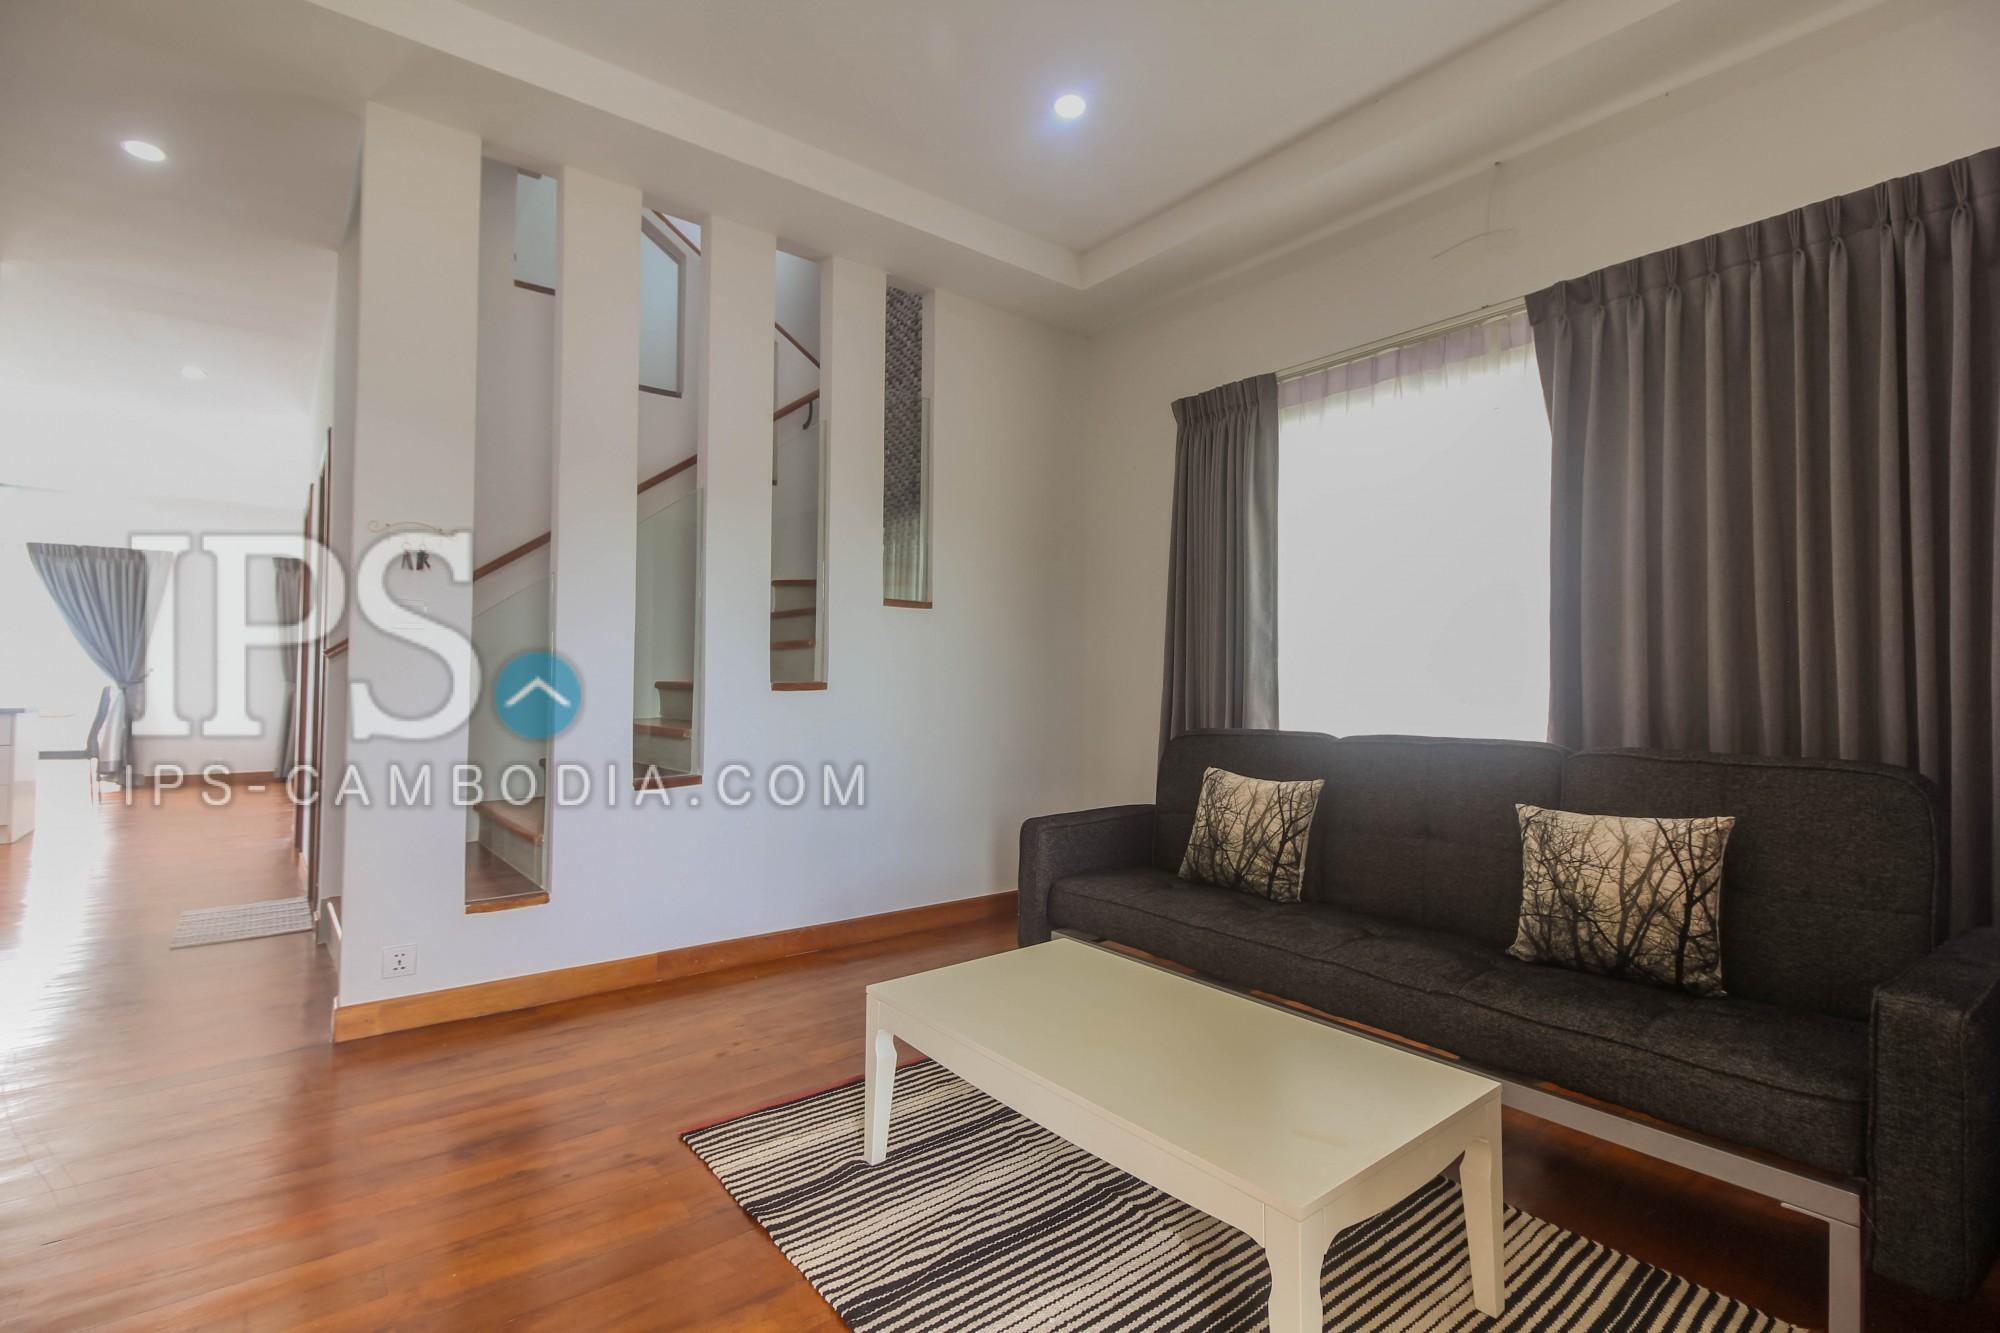 3 Bedroom  Villa For Rent - Sra Ngae, Siem Reap